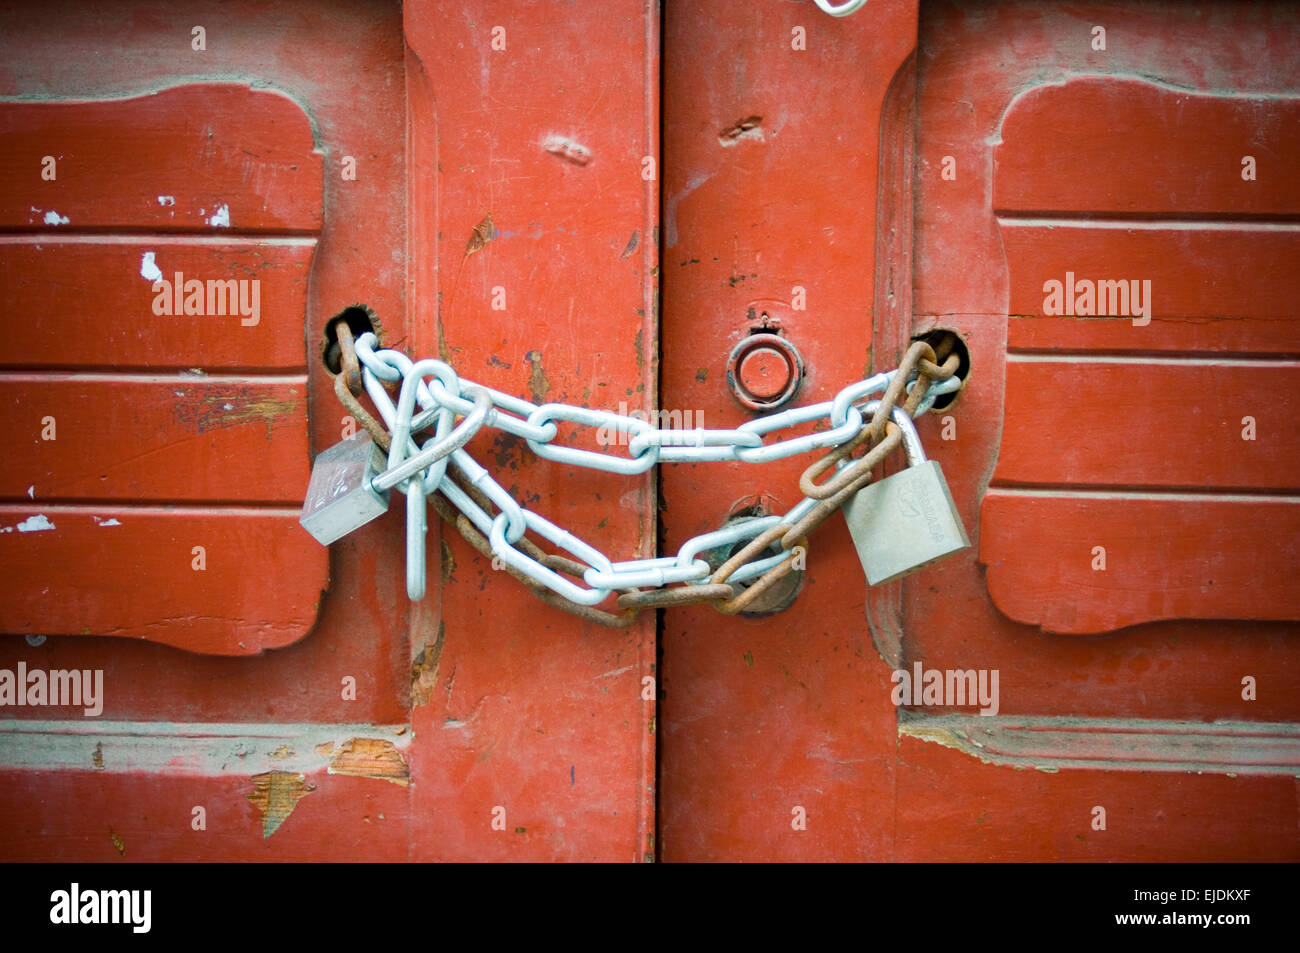 Stock Photo - padlock padlocked padlocks chain up lock locks locked security secure gate gates door doors secured against theft thieve thieves & padlock padlocked padlocks chain up lock locks locked security ... Pezcame.Com